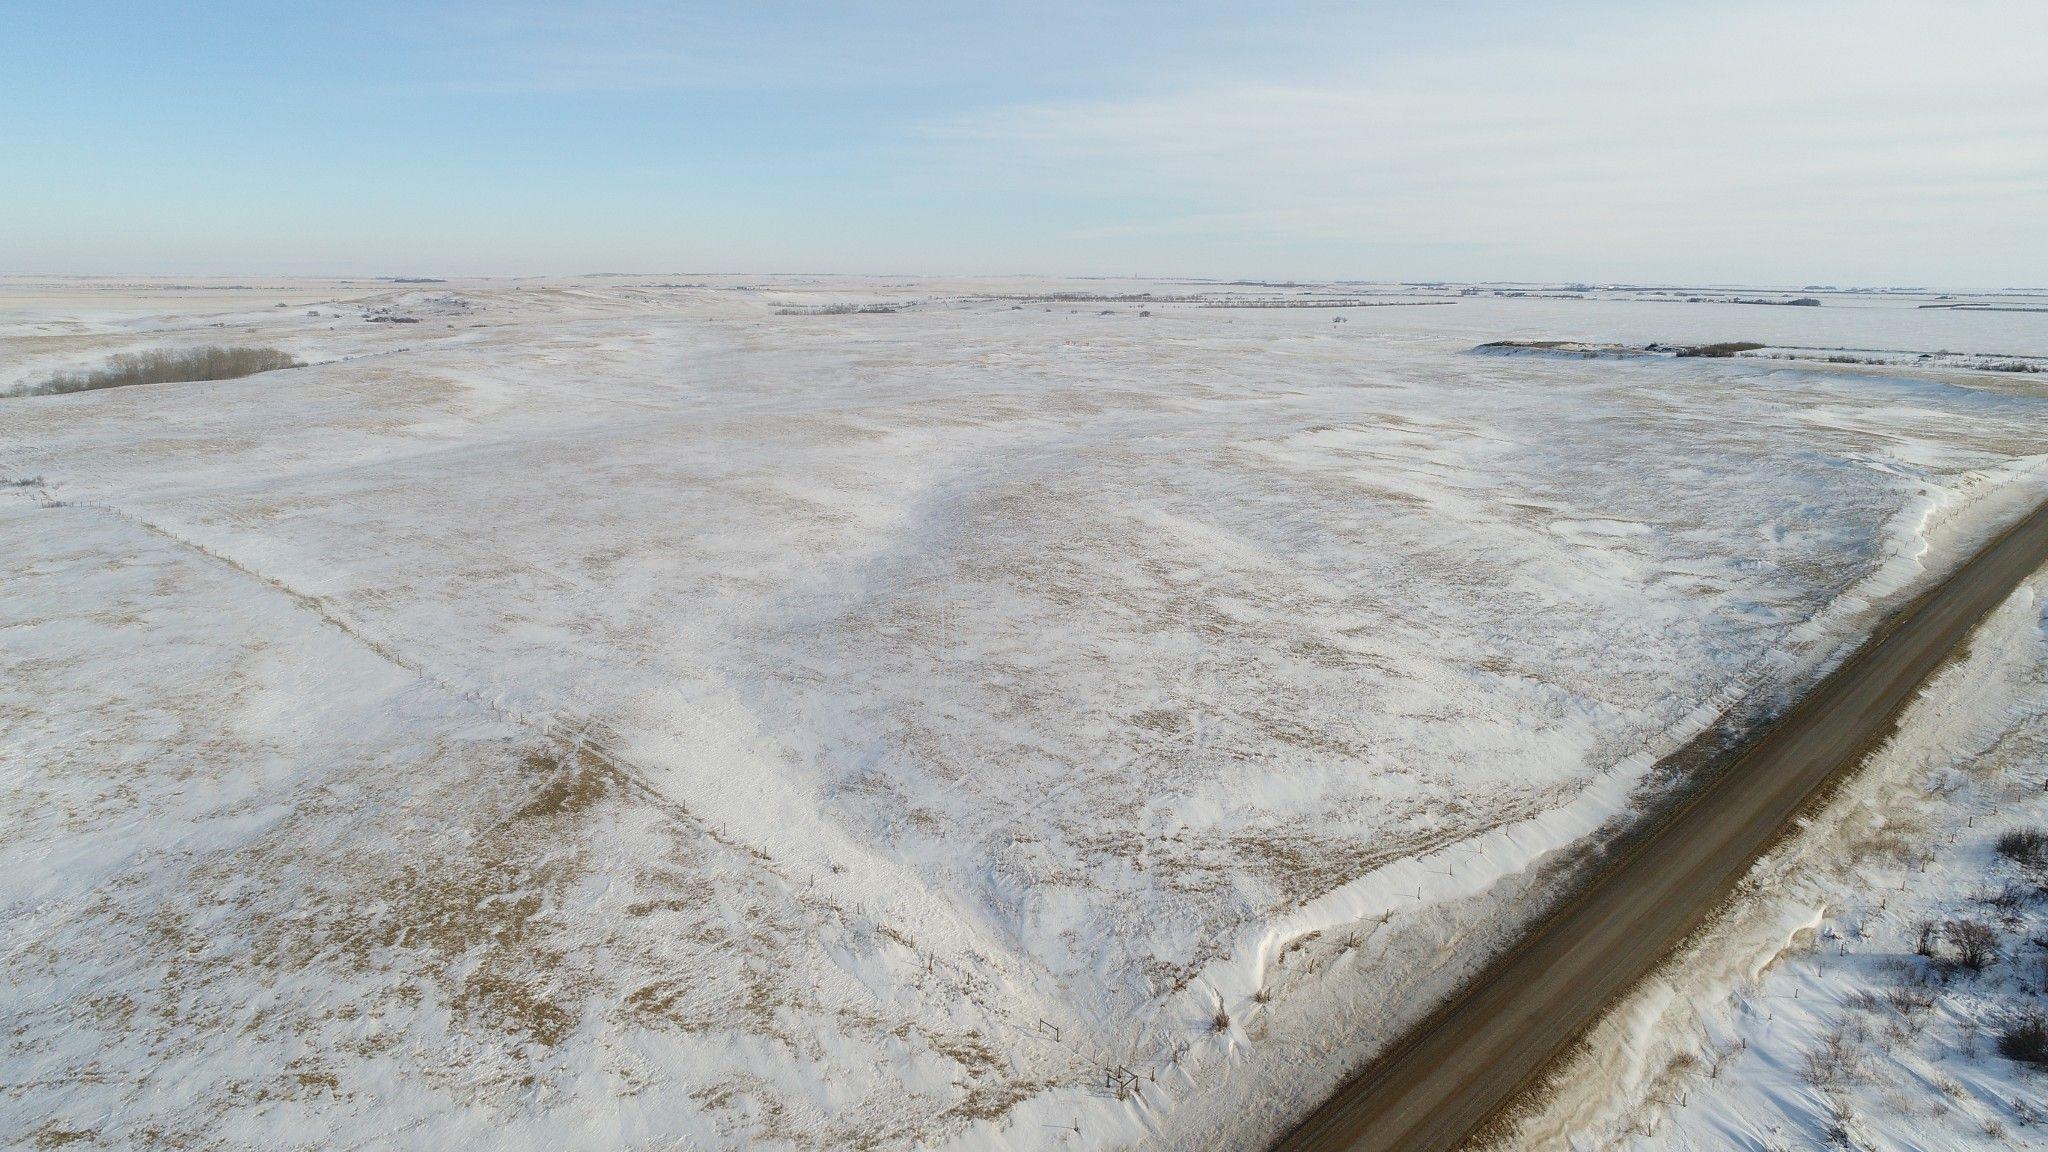 Main Photo: 142.67 Acres - RM Huron #223 - Tugaske, SK Area